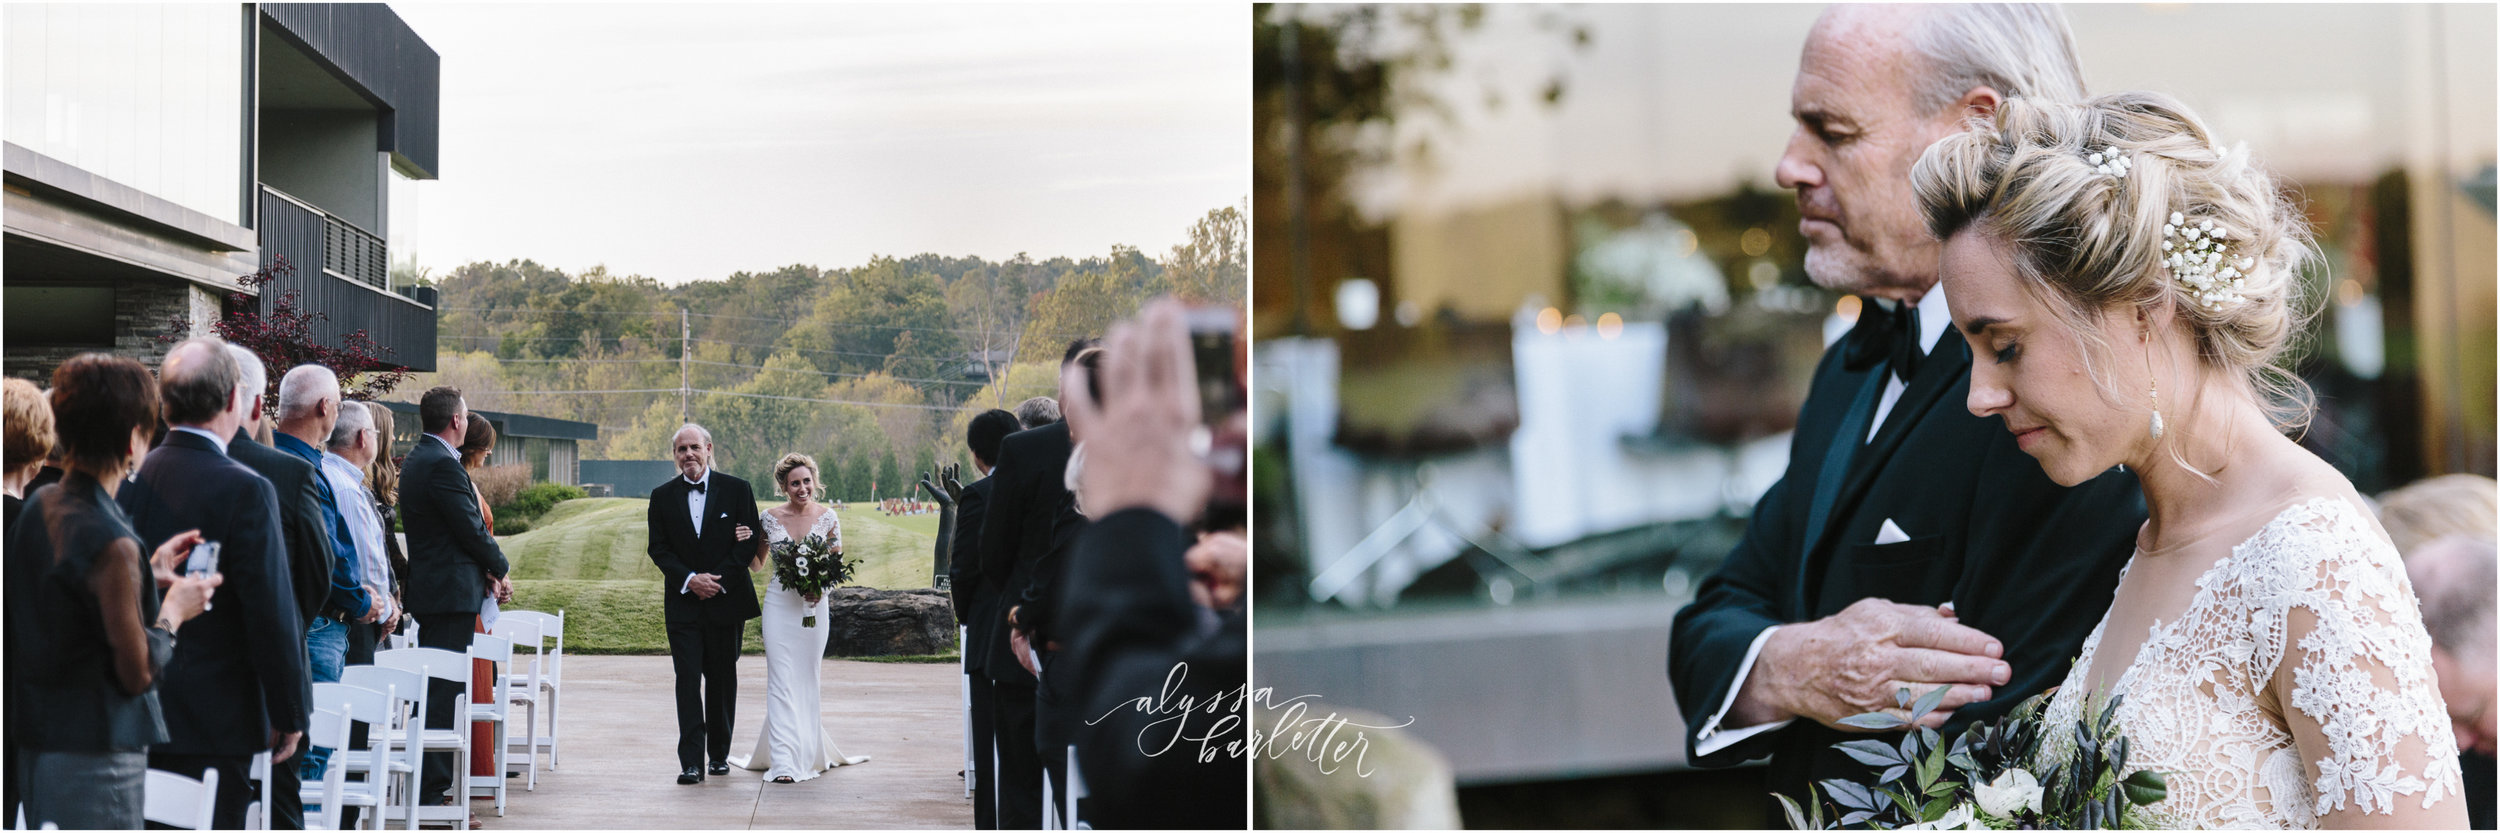 alyssa barletter photography fayetteville arkansas wedding photos micah and colin-1-42.jpg